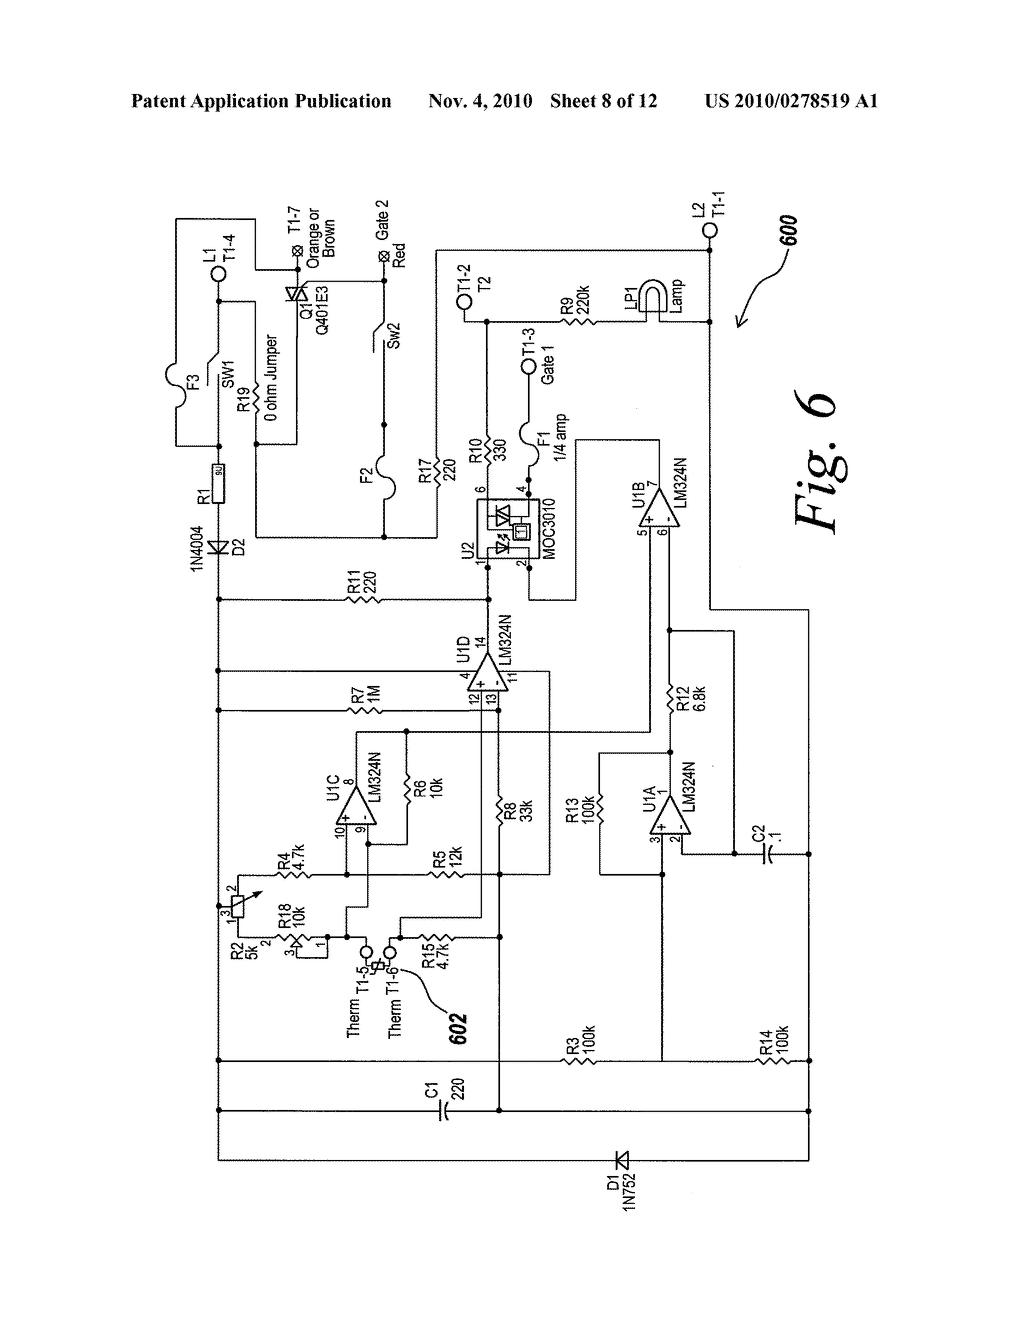 dayton motor wiring diagram on 220 volt thermostat wiring diagram